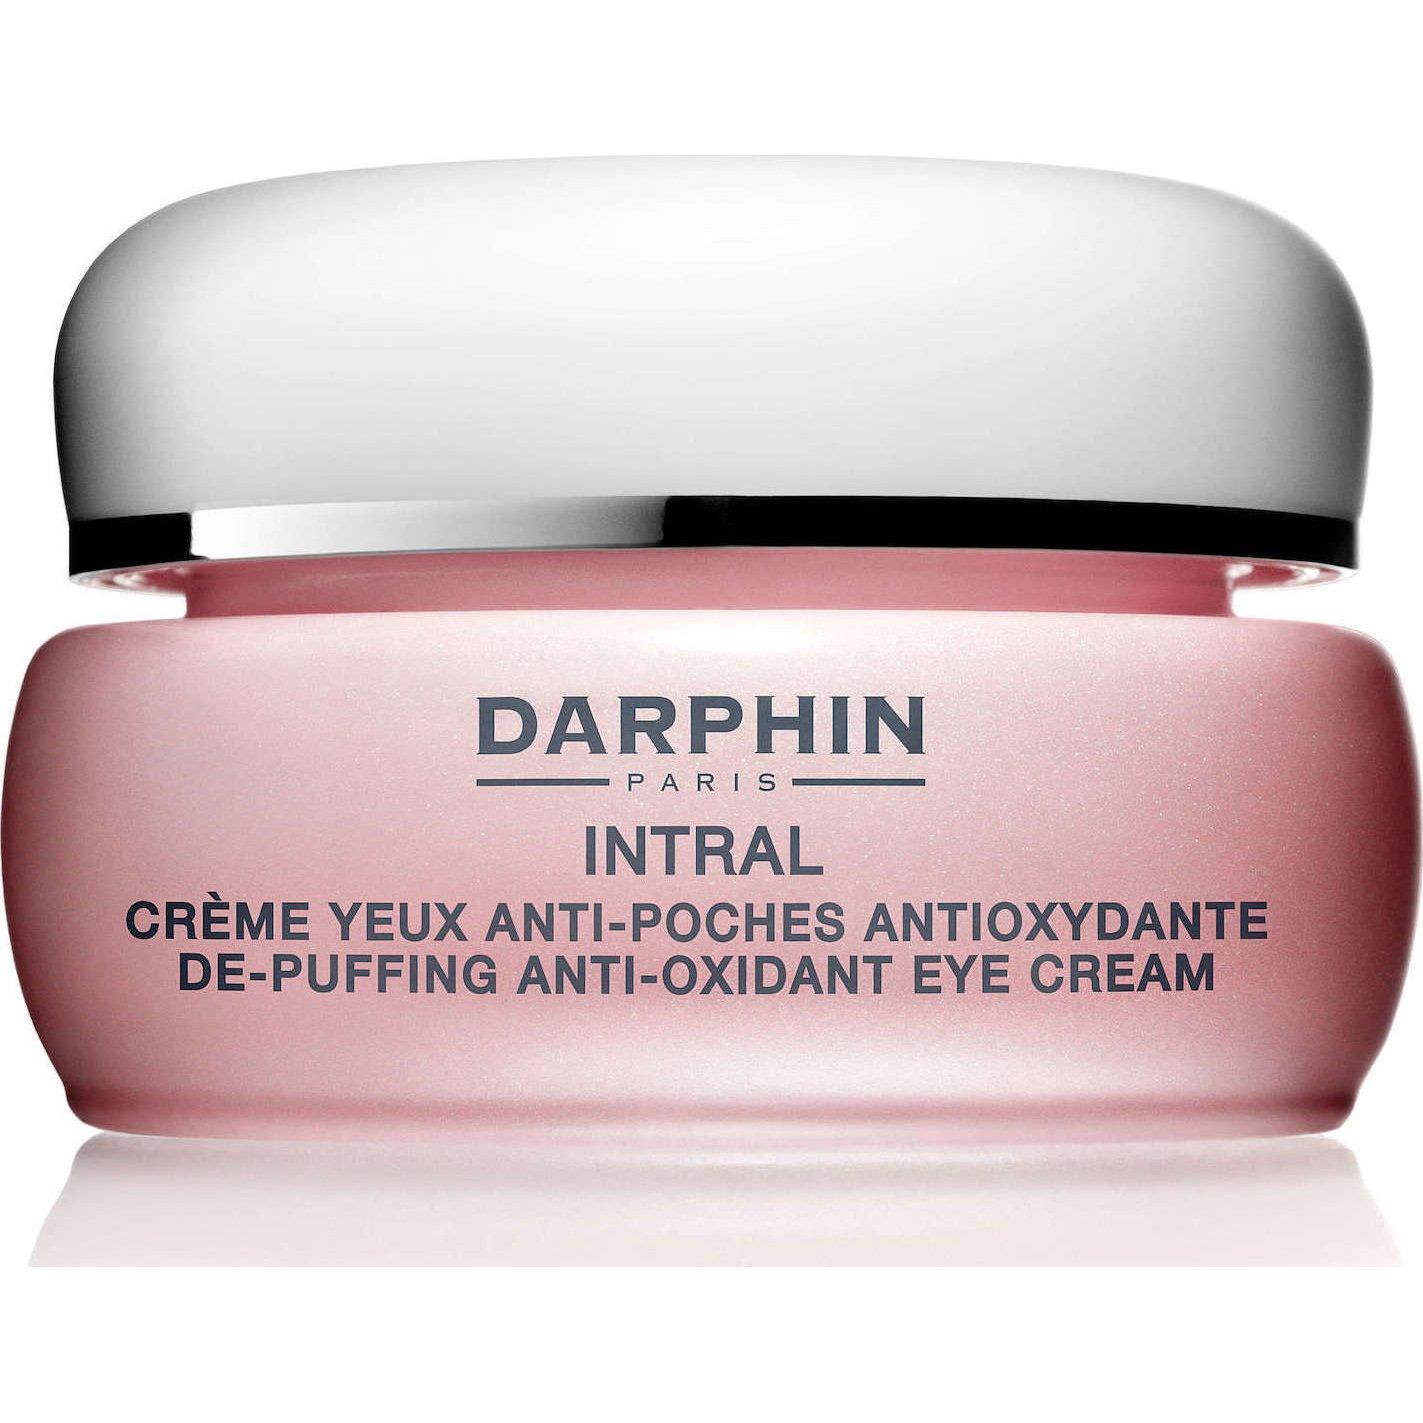 Darphin Intral De-Puffing Anti-Oxidant Eye Cream Κρέμα με Υφή Gel για Μάτια με Ισχυρή Αντιοξειδωτική Δράση 15ml